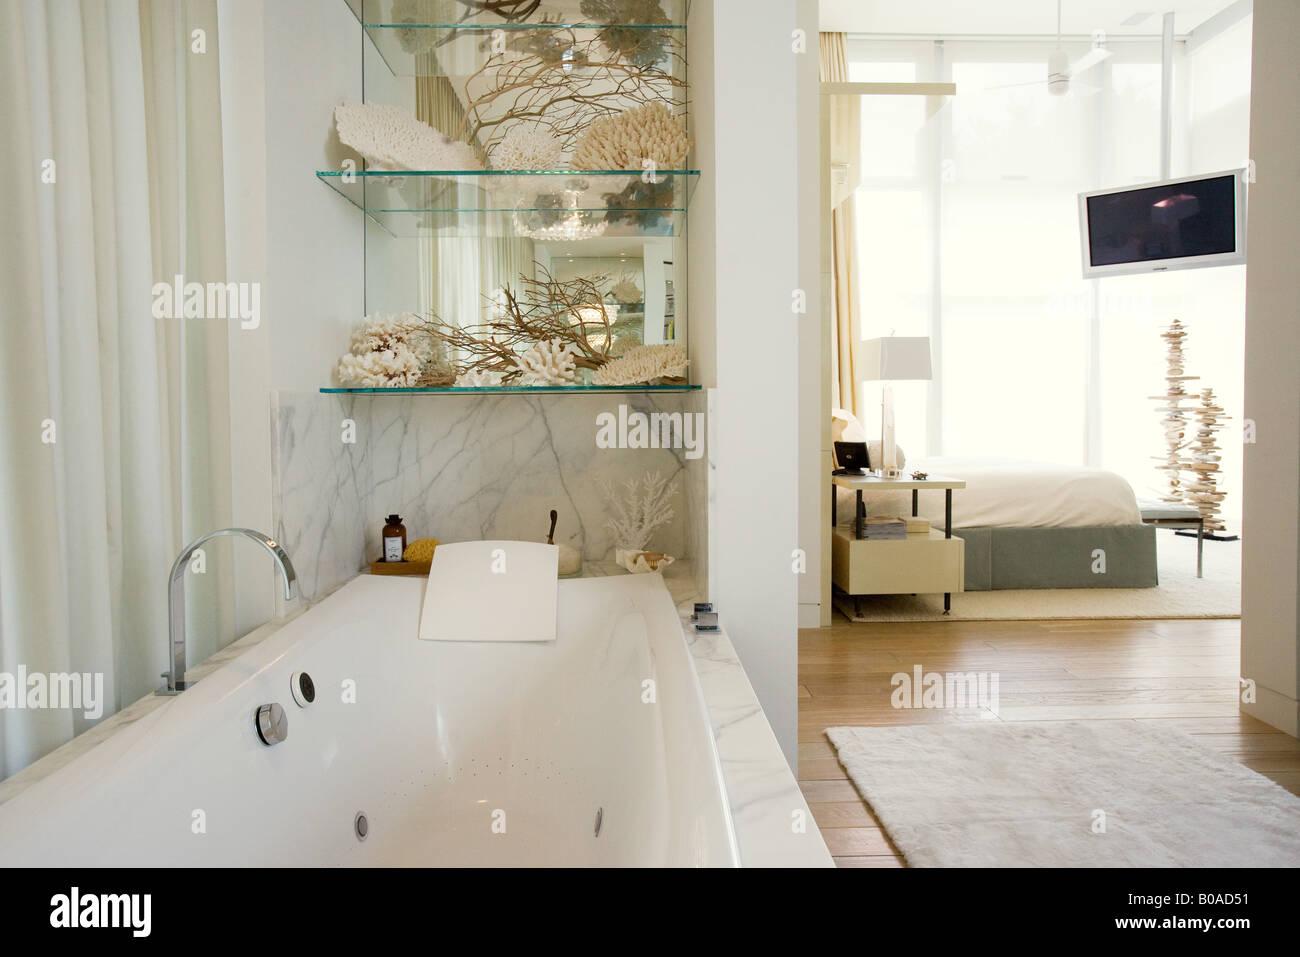 Luxury hotel bathroom with large bathtub, bedroom in background ...